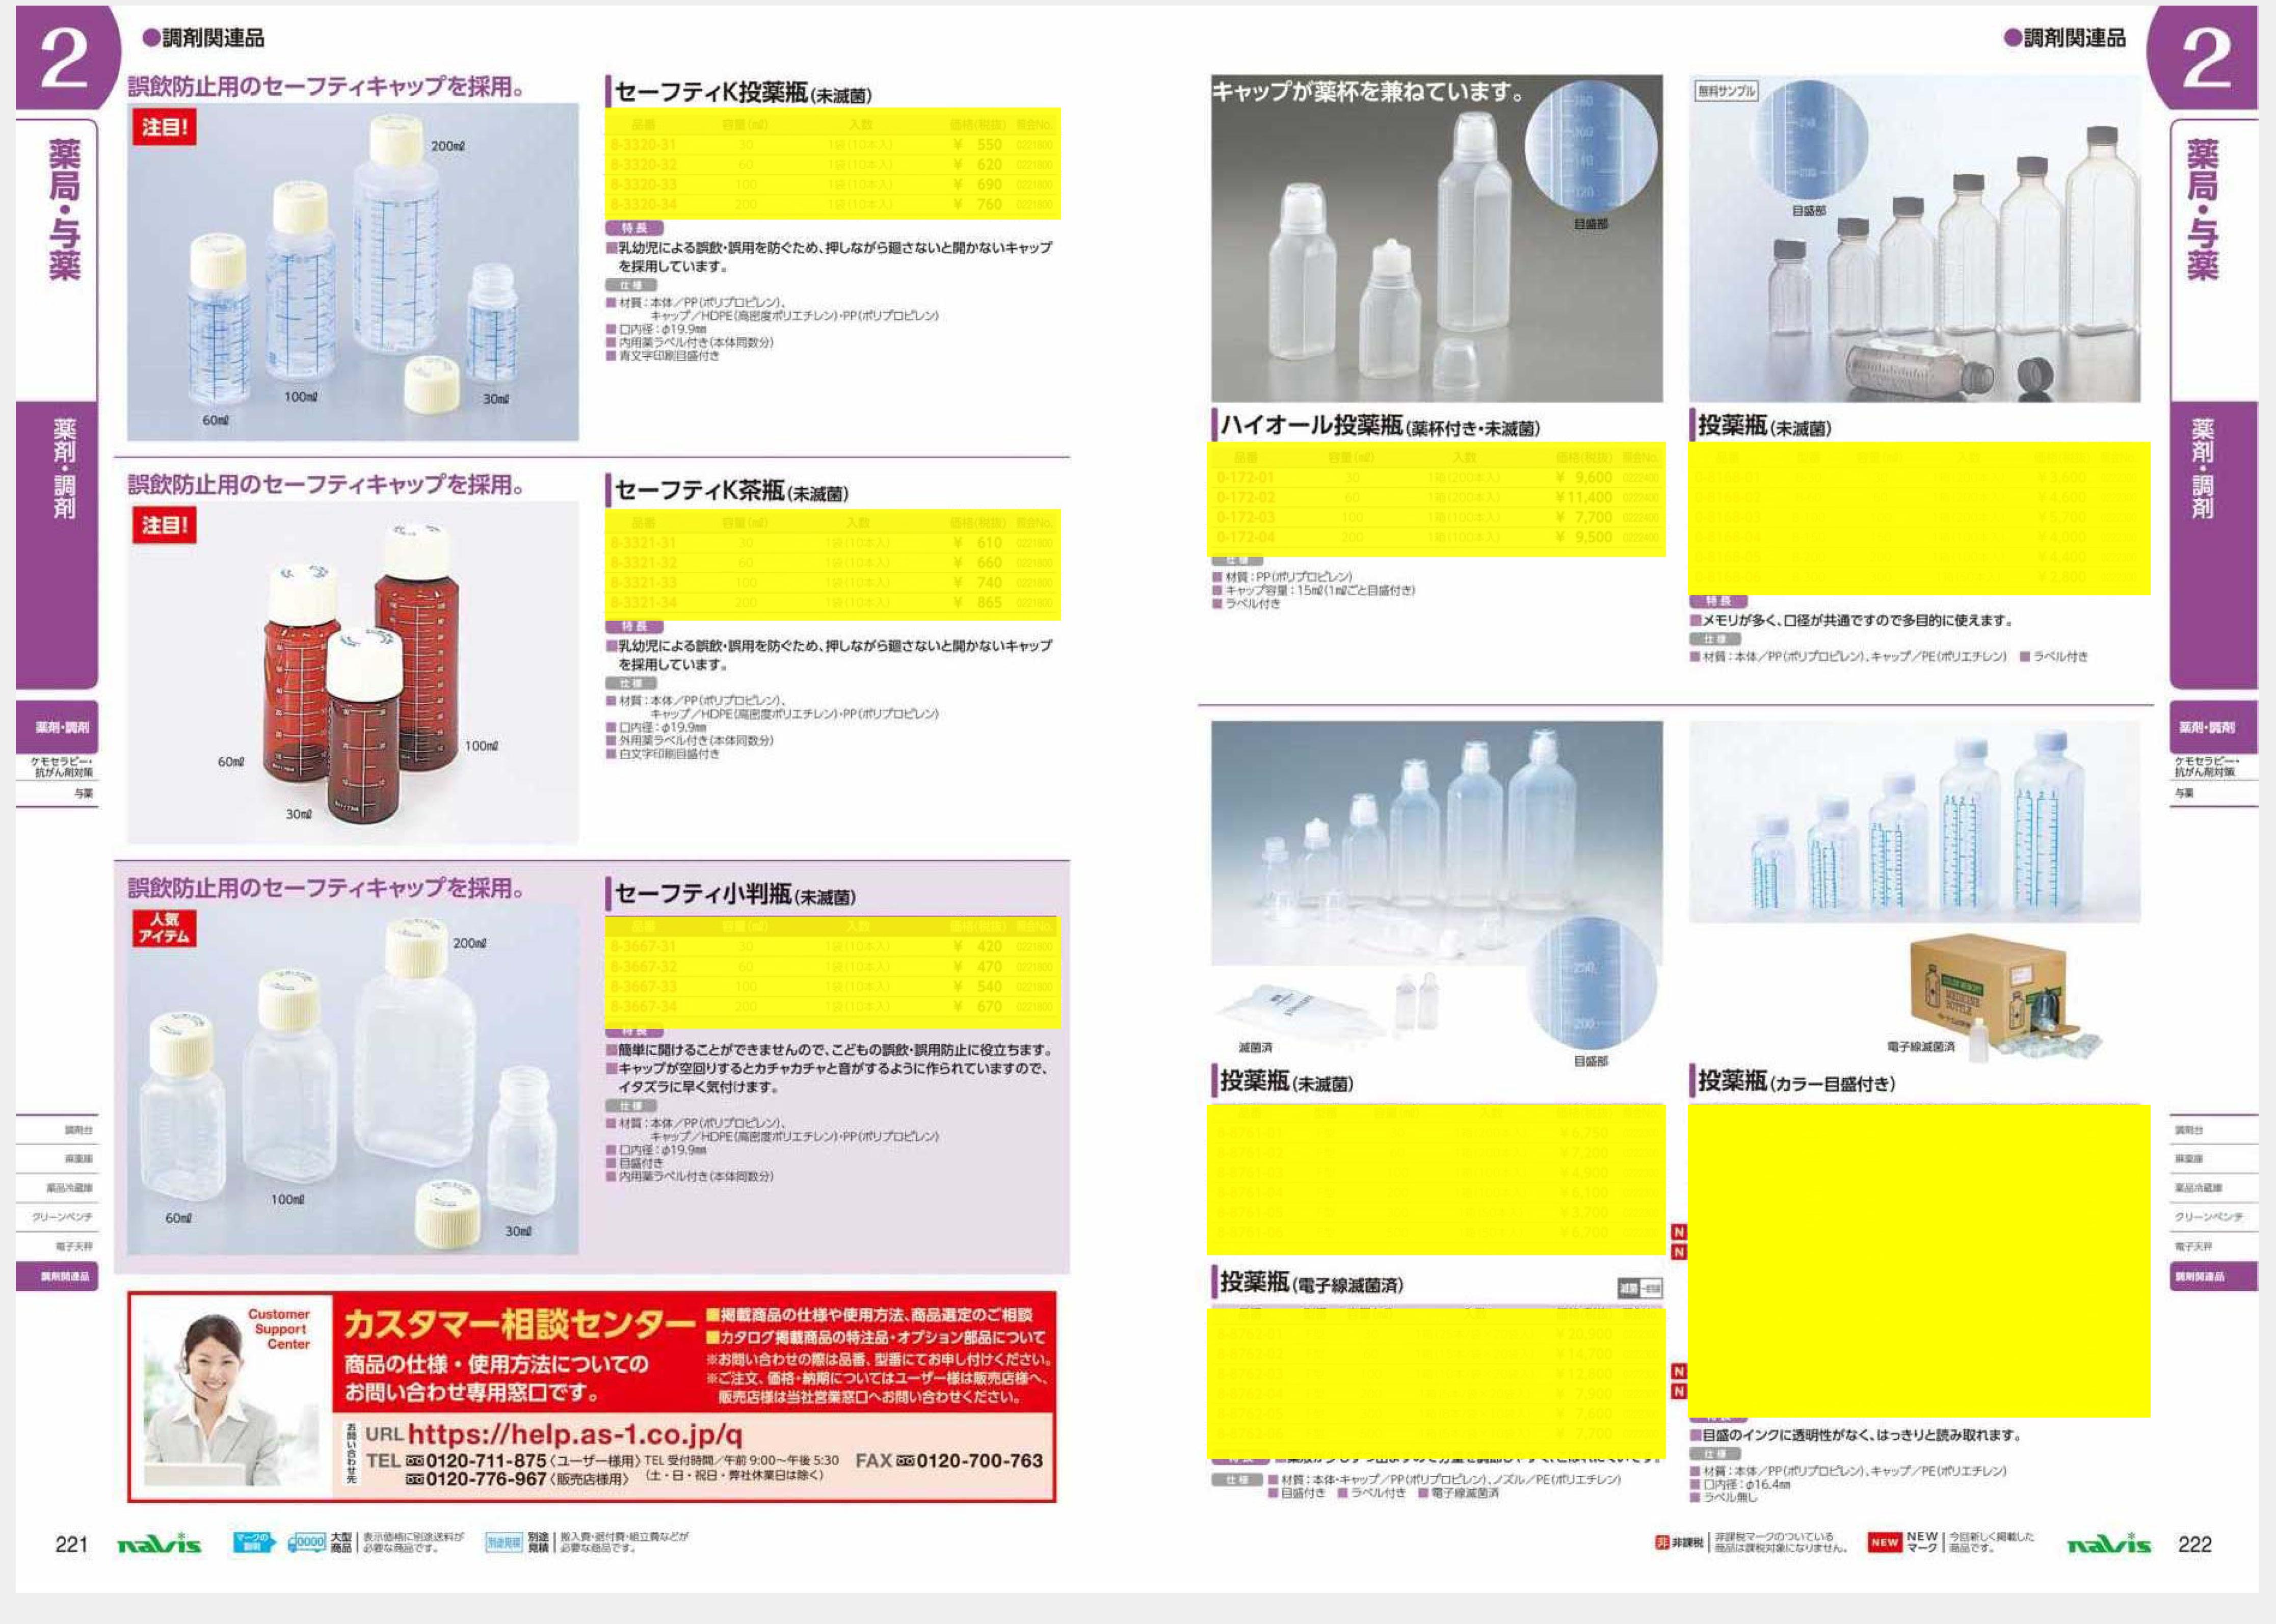 ナビス50000 8-8762-02 F型投薬瓶(電子線滅菌済) 60mL[袋](as1-8-8762-02)